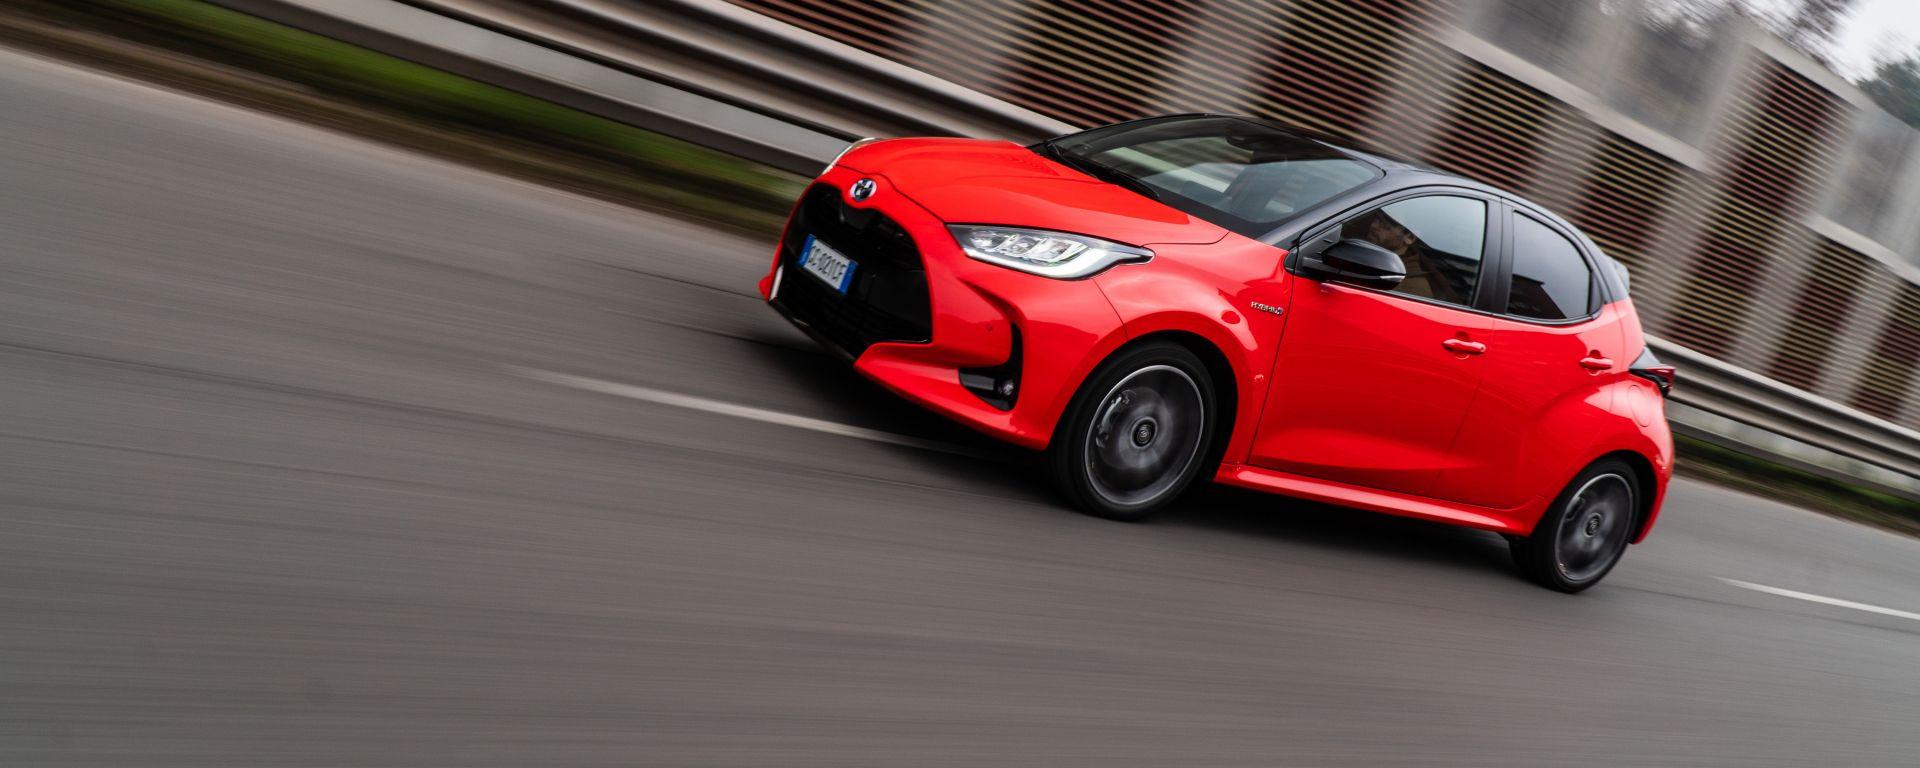 Al volante della Toyota Yaris Hybrid